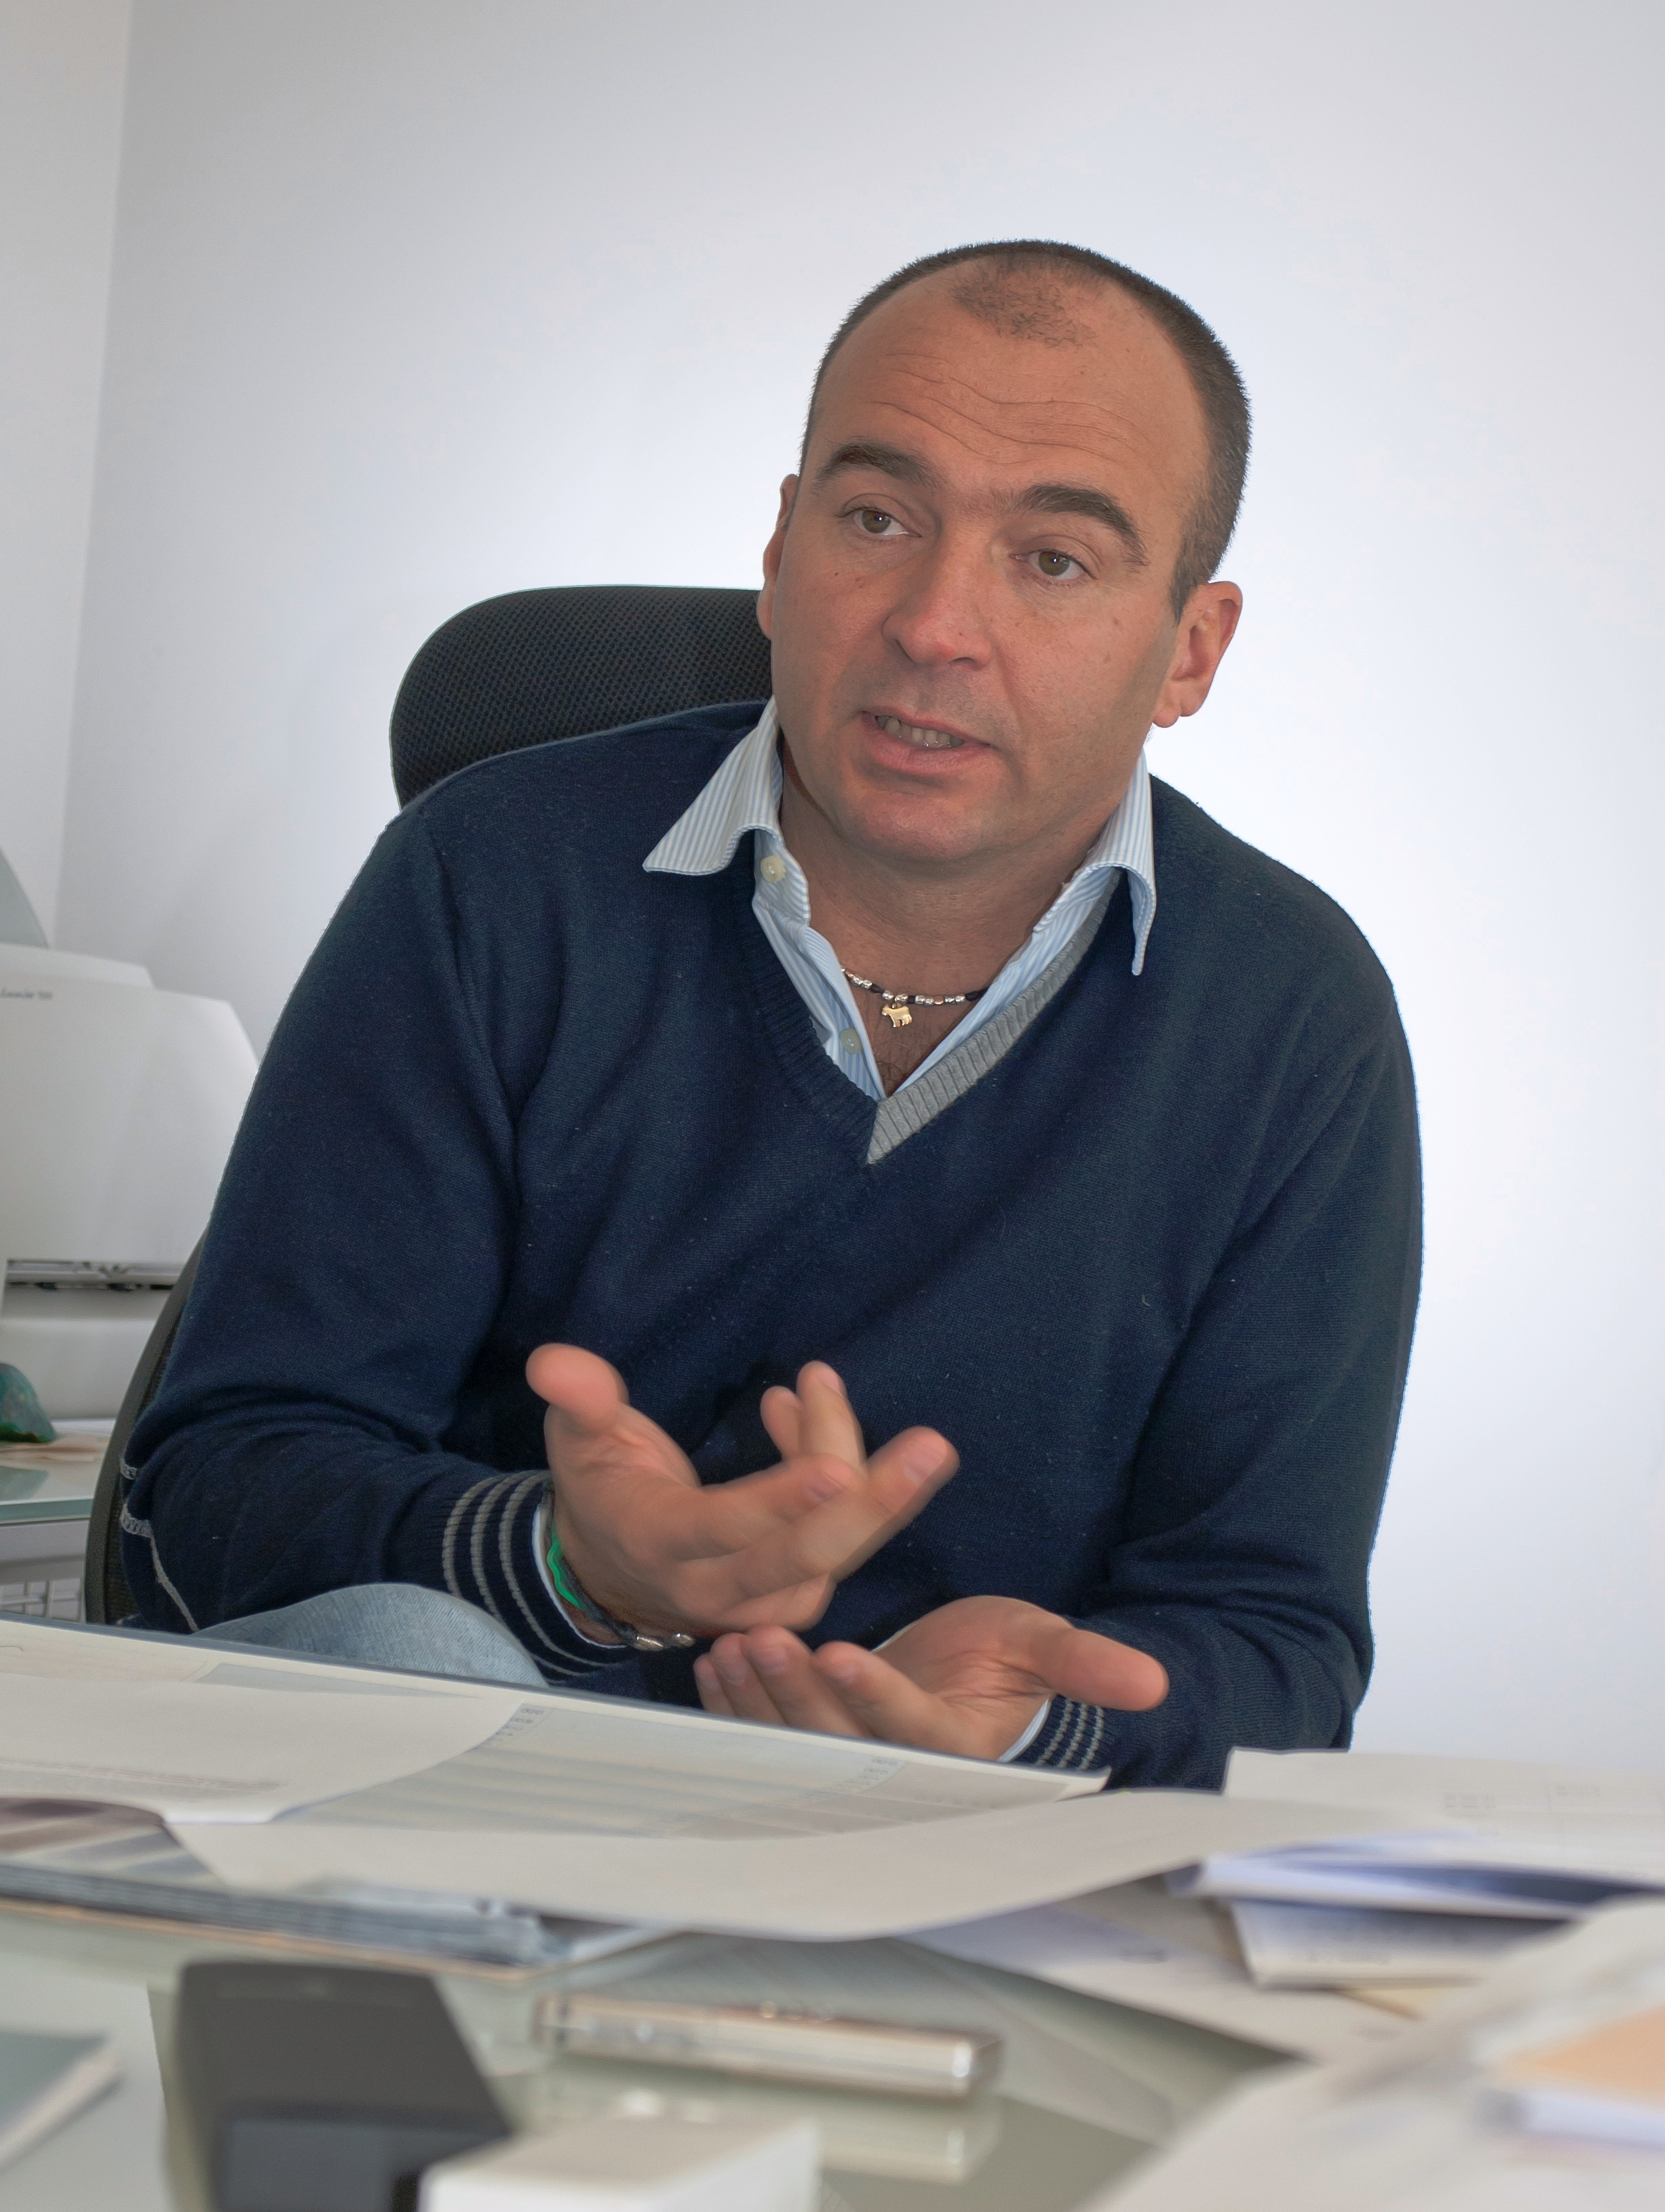 Vittorio Zunino, Presidente e Founder di Sidin